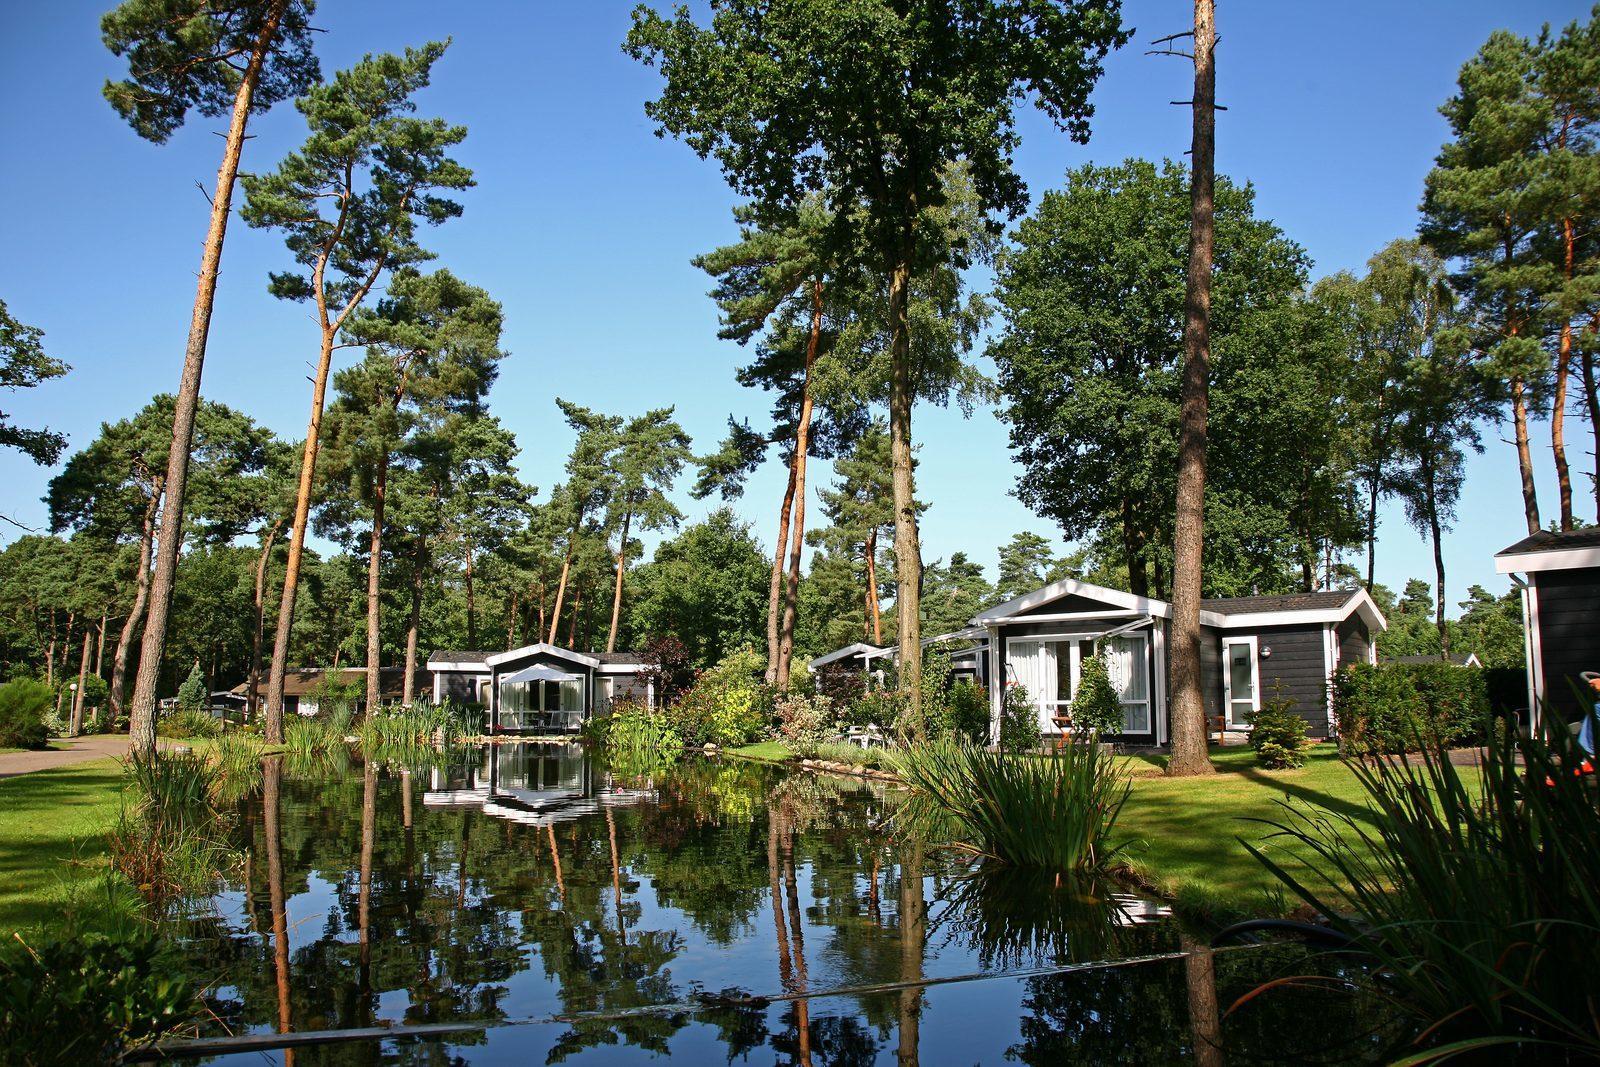 Ferienpark Hessenheem